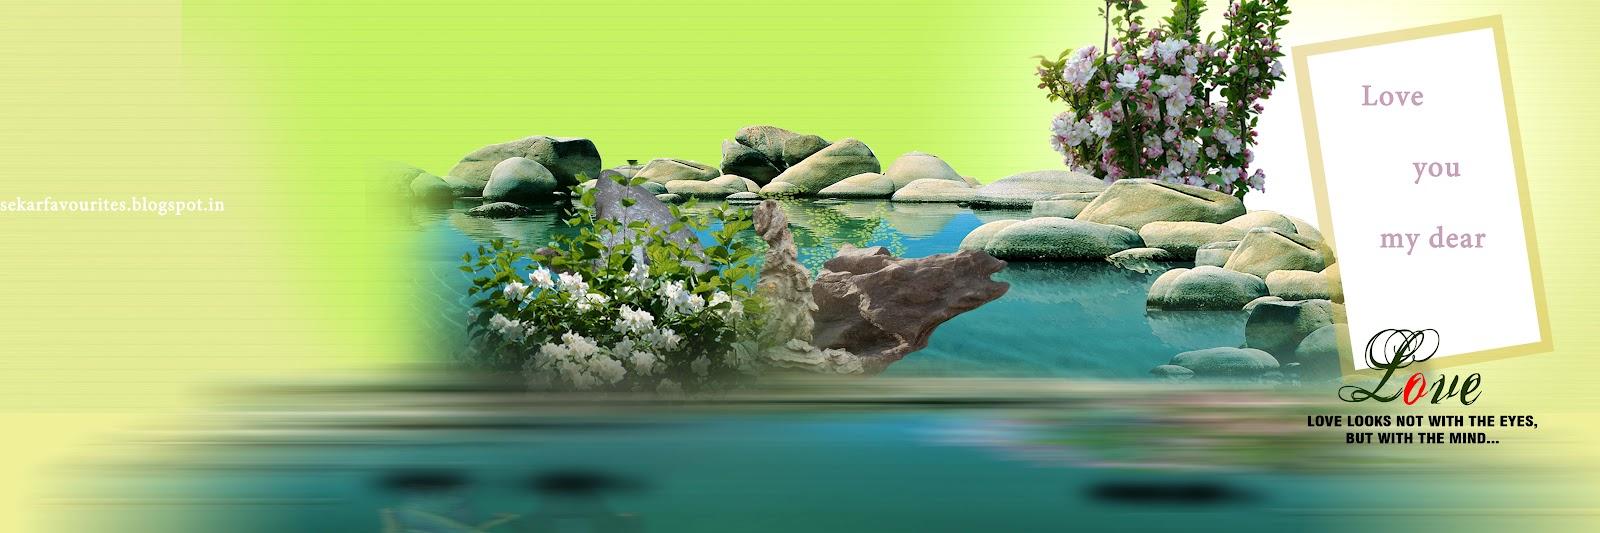 Photoshop clipart karizma album RESOLUTION TEMPLATES FREE Frames(Karizma PHOTOSHOP